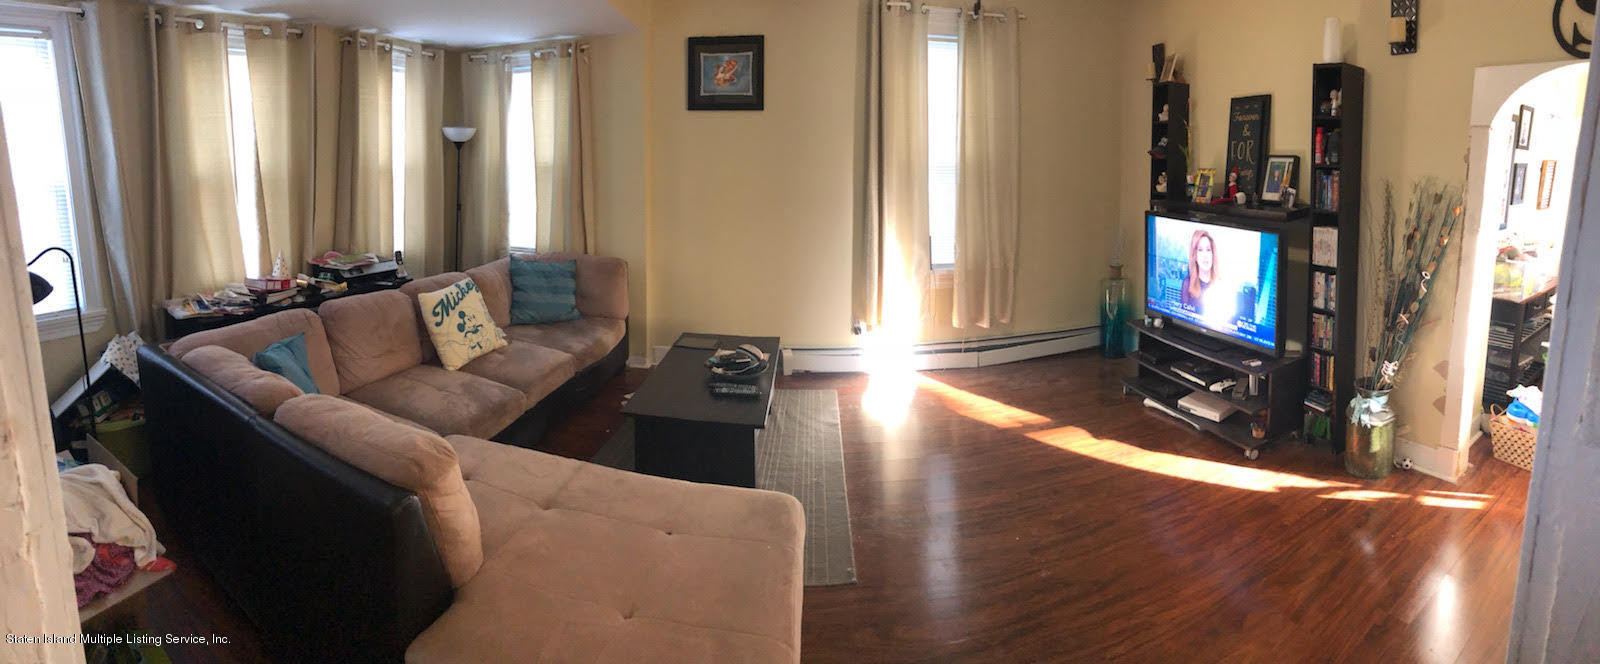 Two Family - Detached 29 Dalton Avenue  Staten Island, NY 10306, MLS-1124022-11